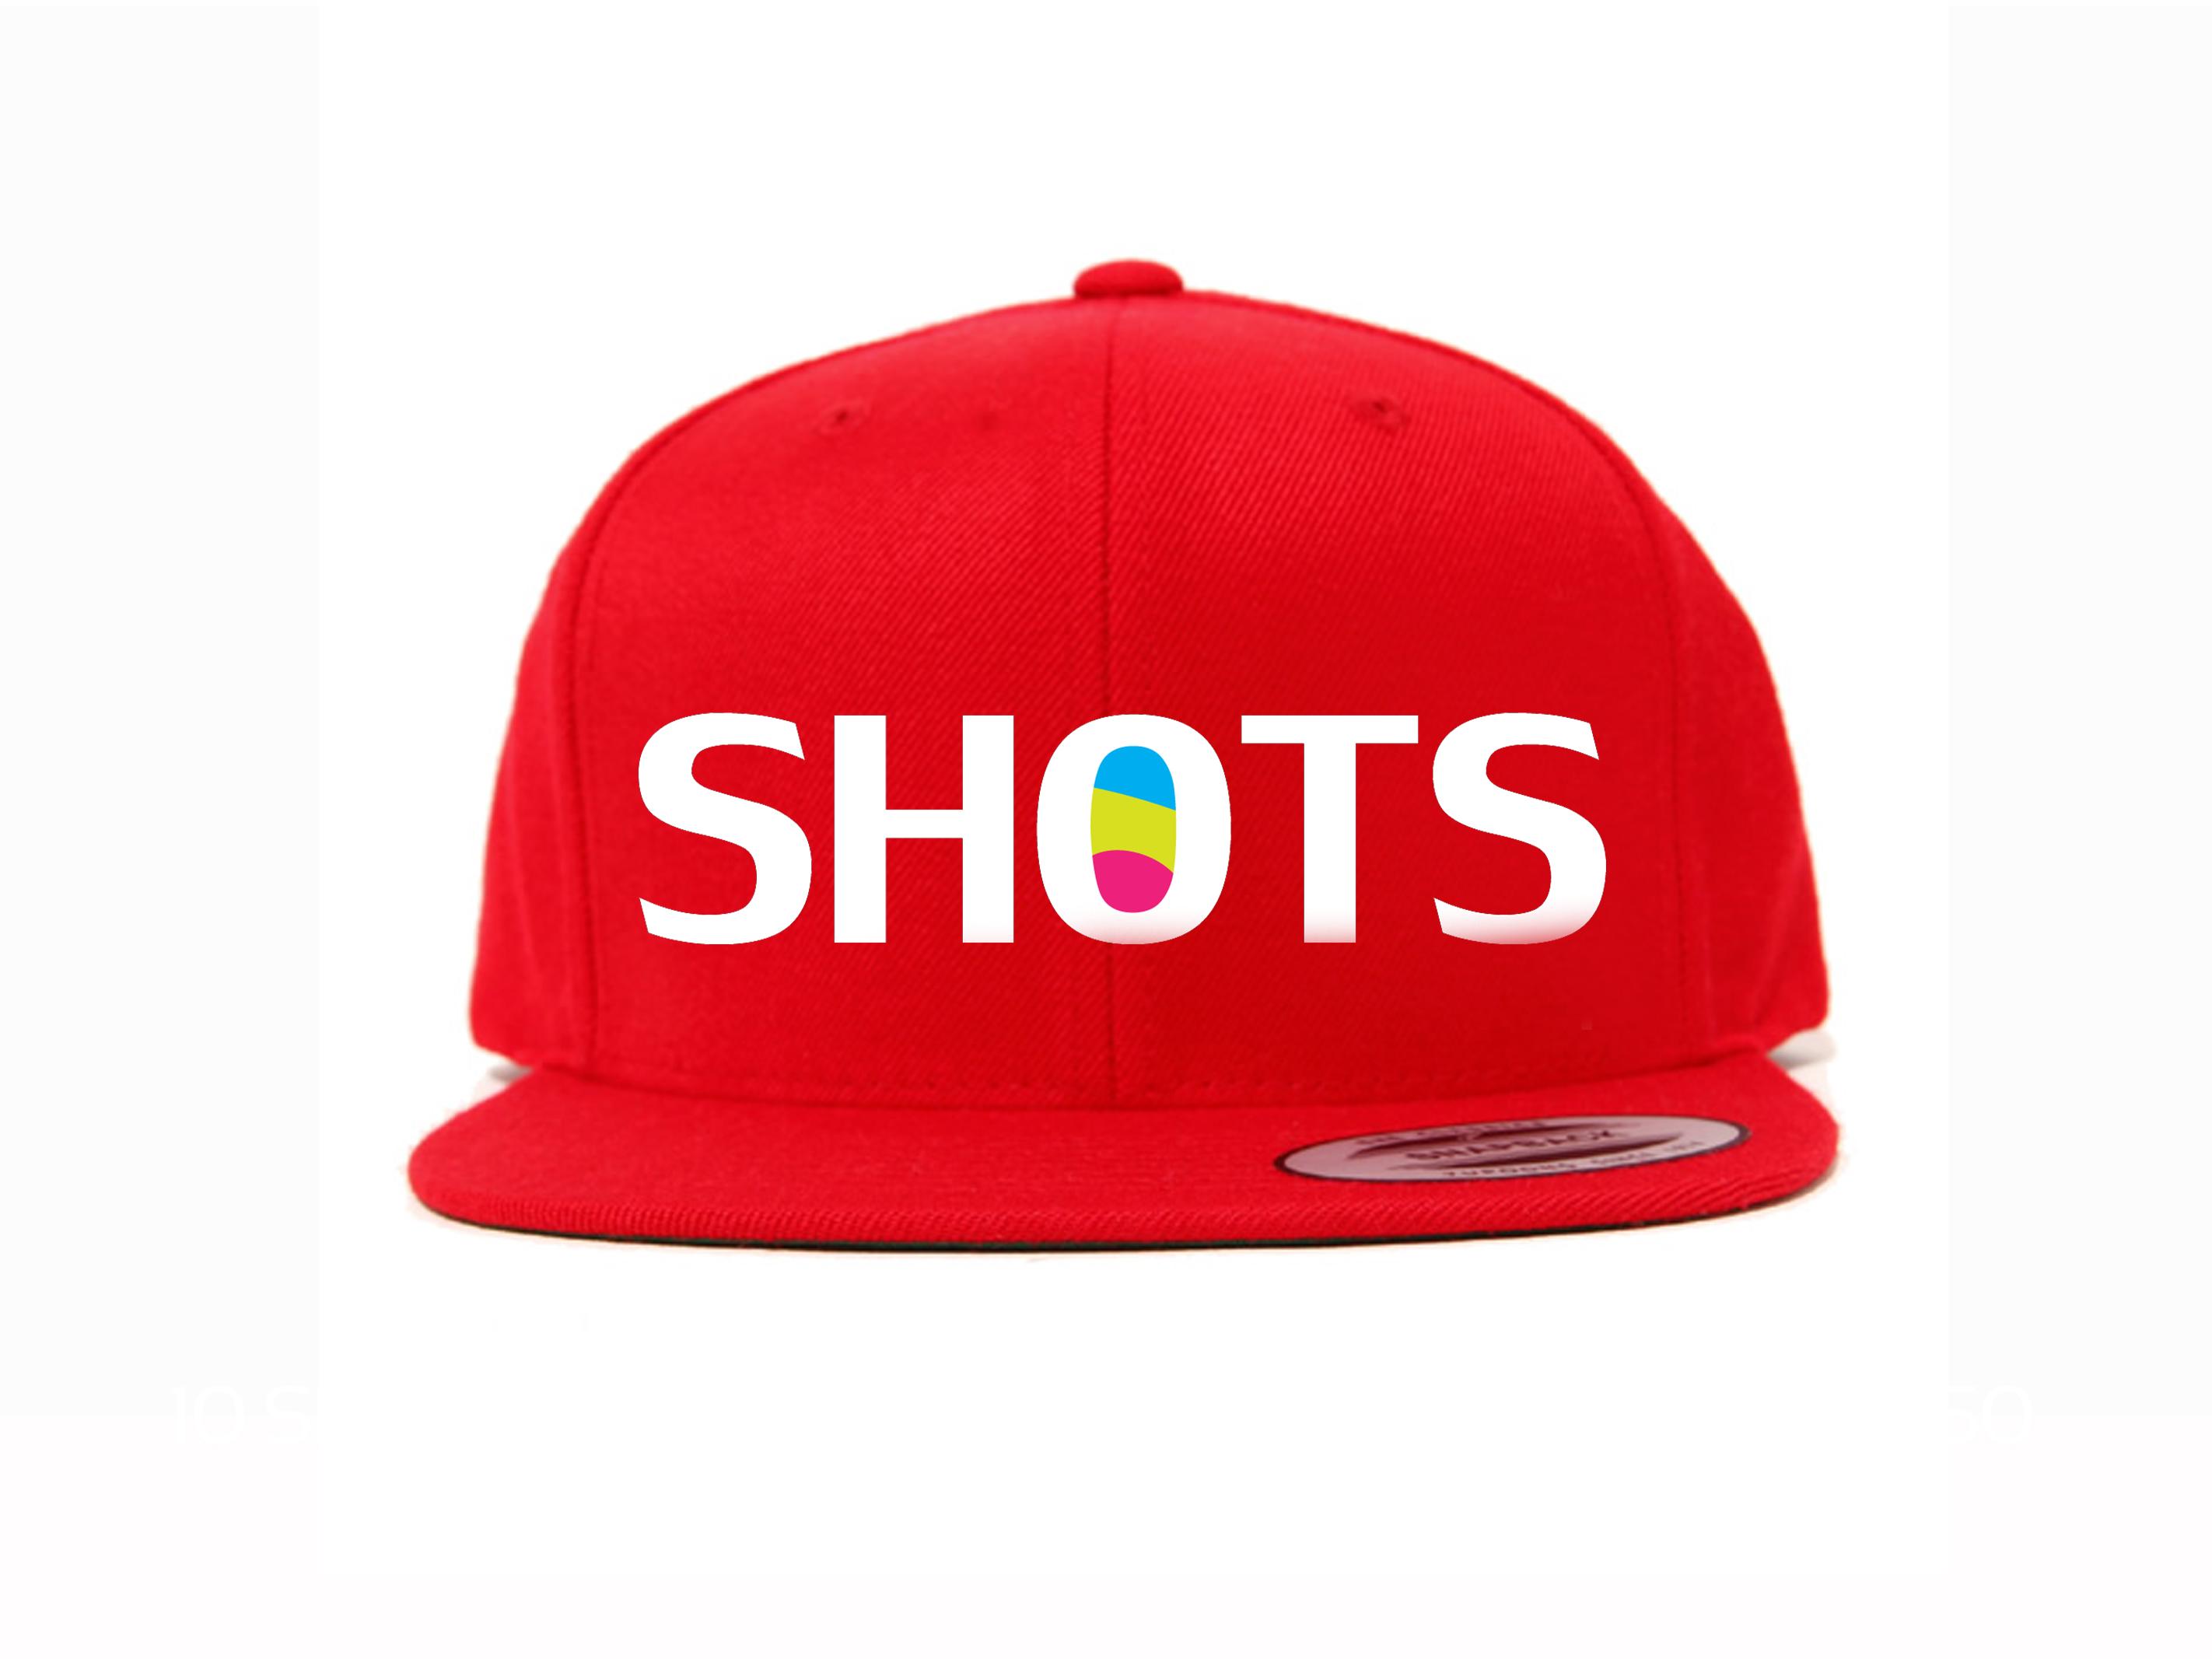 Red SHOTS Snapback